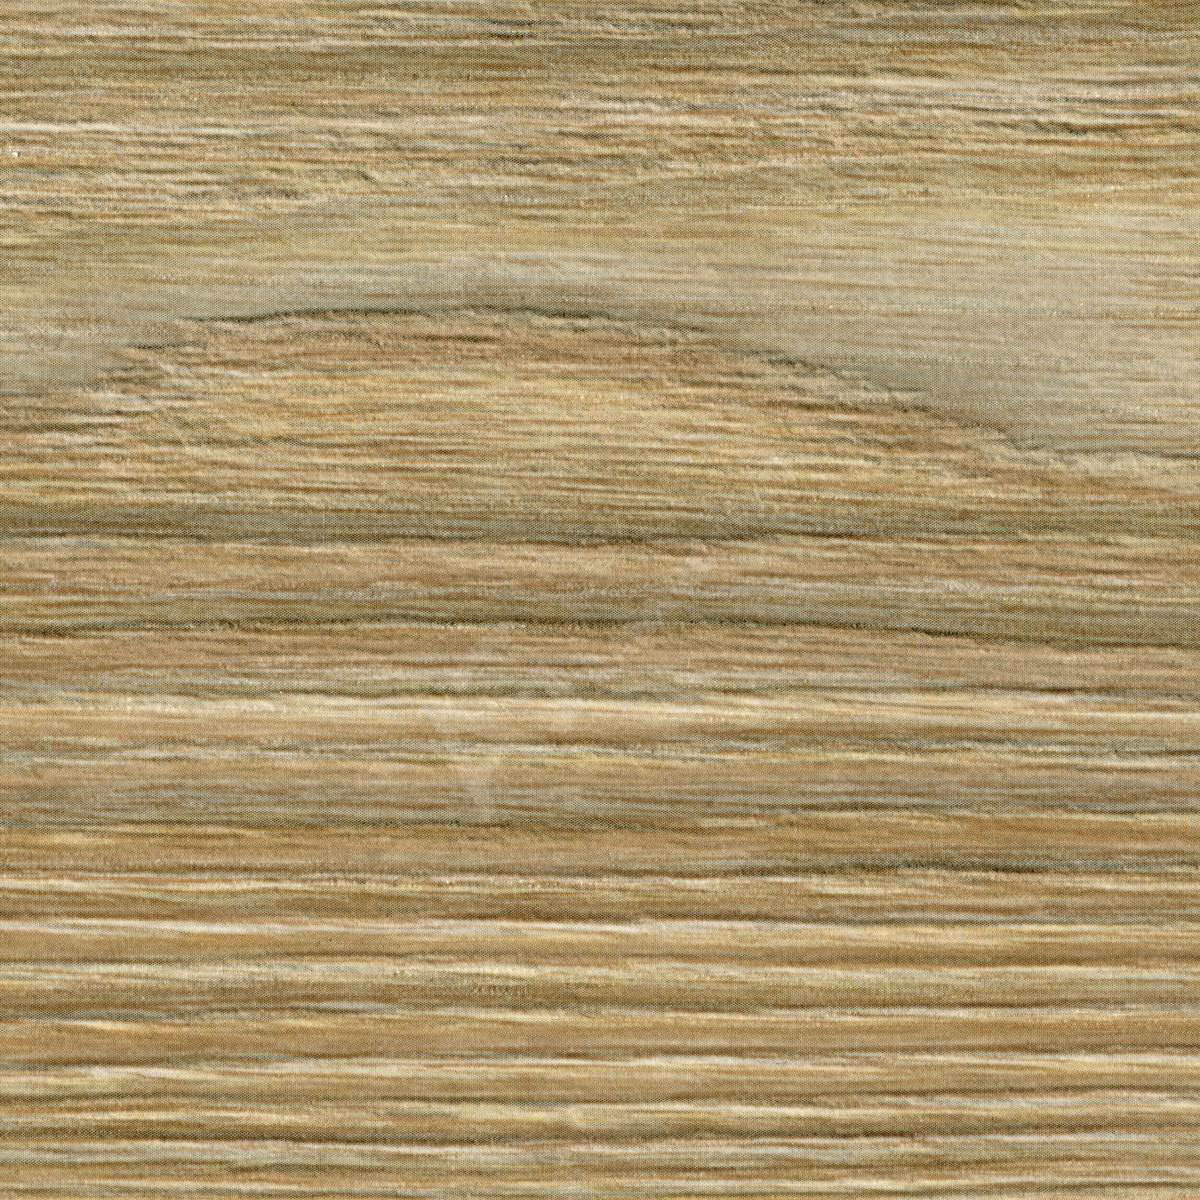 Вяз каньон вековой LW 653-2